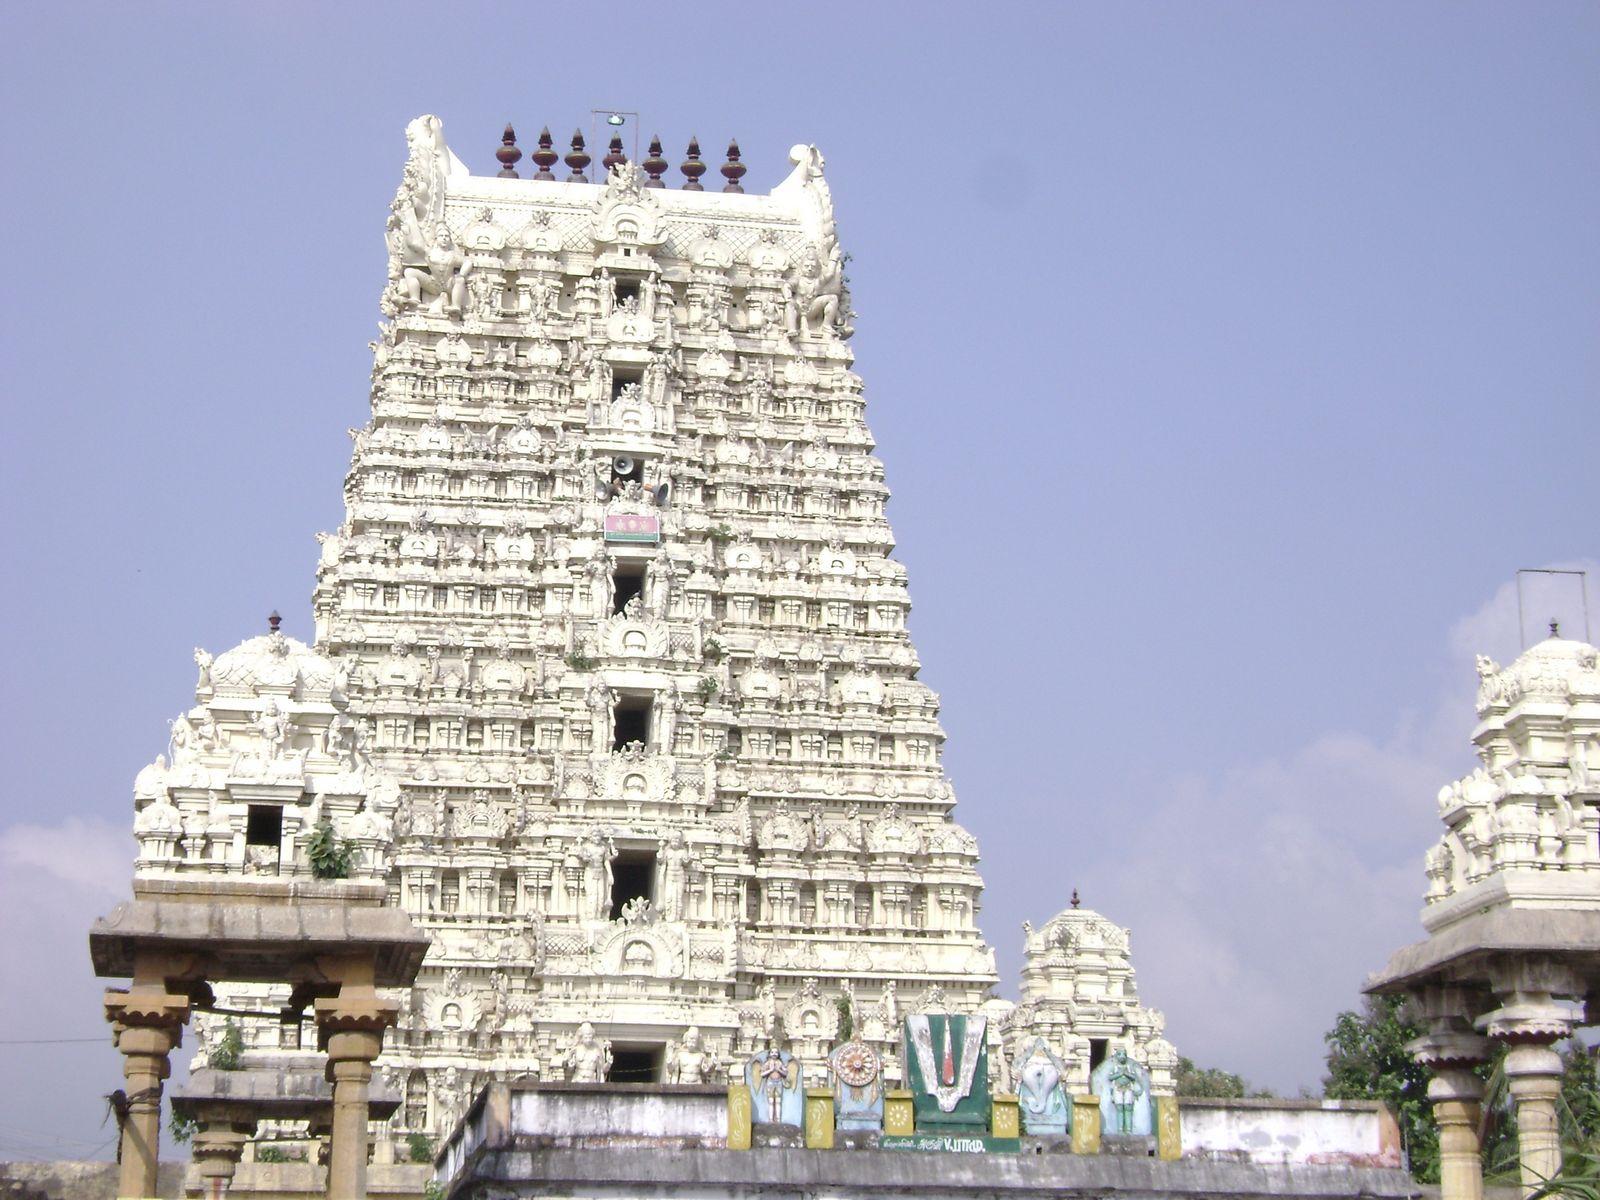 Sri Thiruvikrama Perumal Temple (ThiruKovilur) Thanjavur - Divya Desam 64